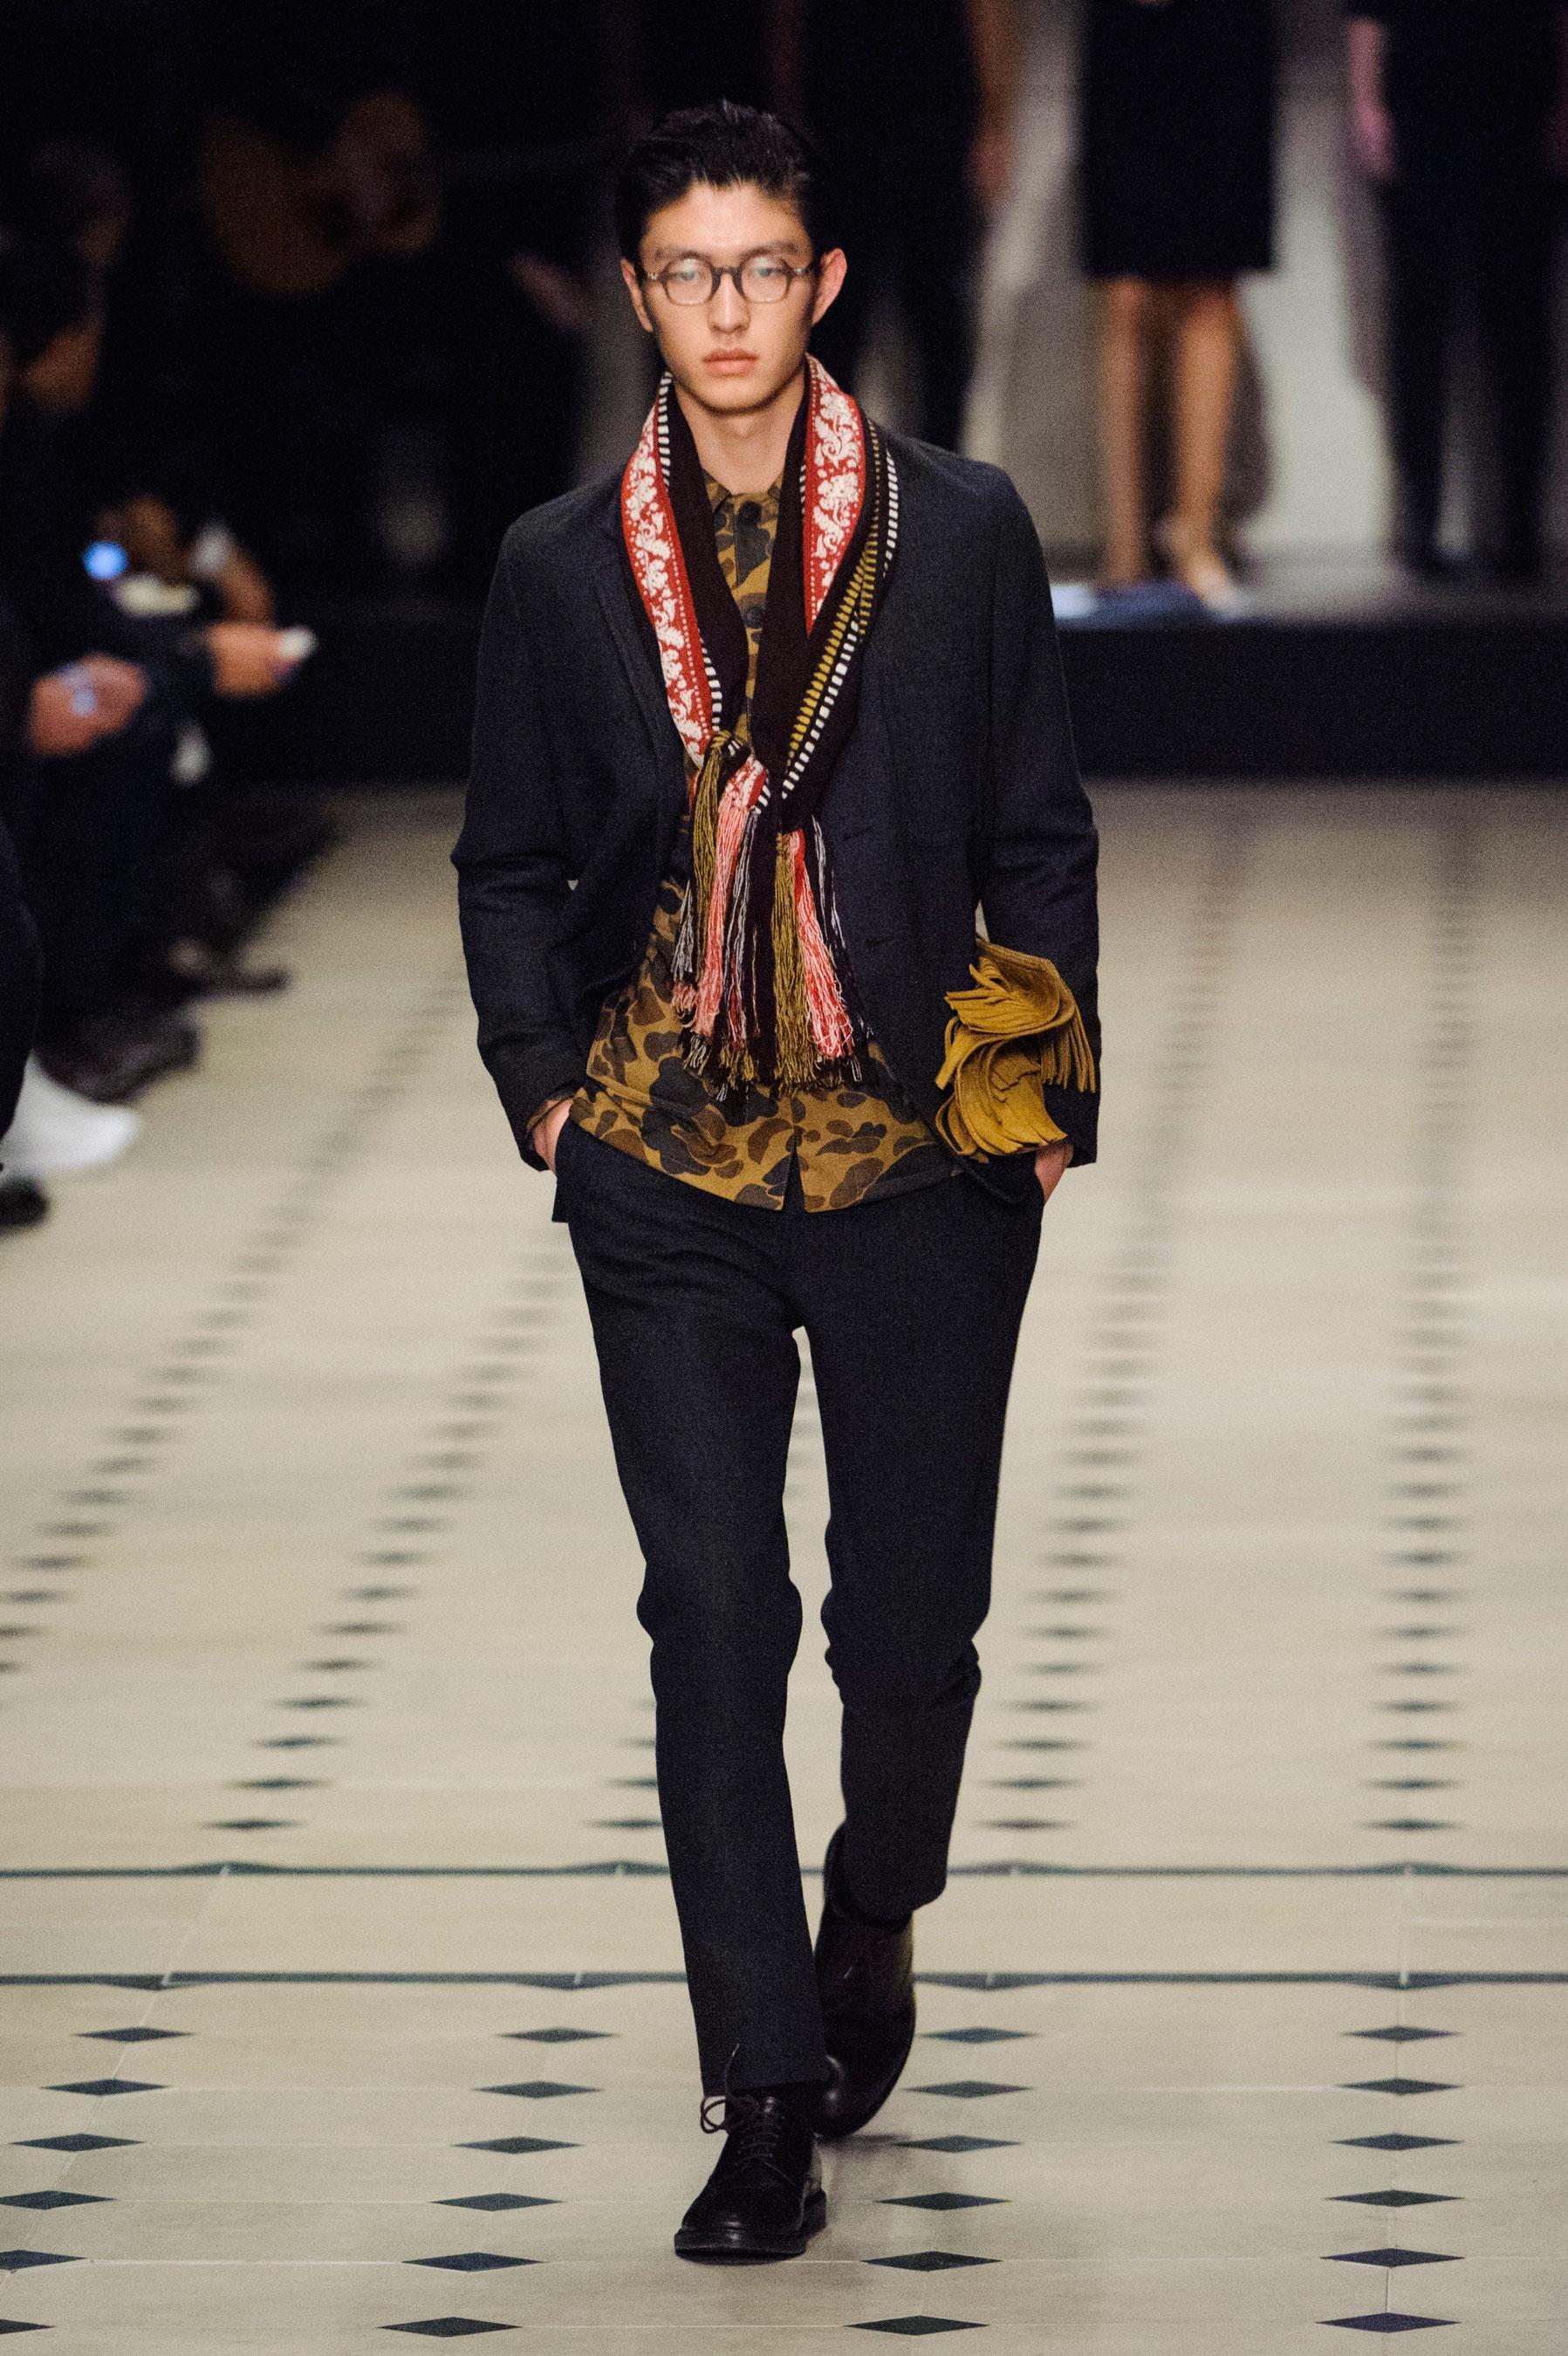 Hiver Défilé Automne 2015 2016 Figaro Homme Madame Burberry OZ8n0kXNwP